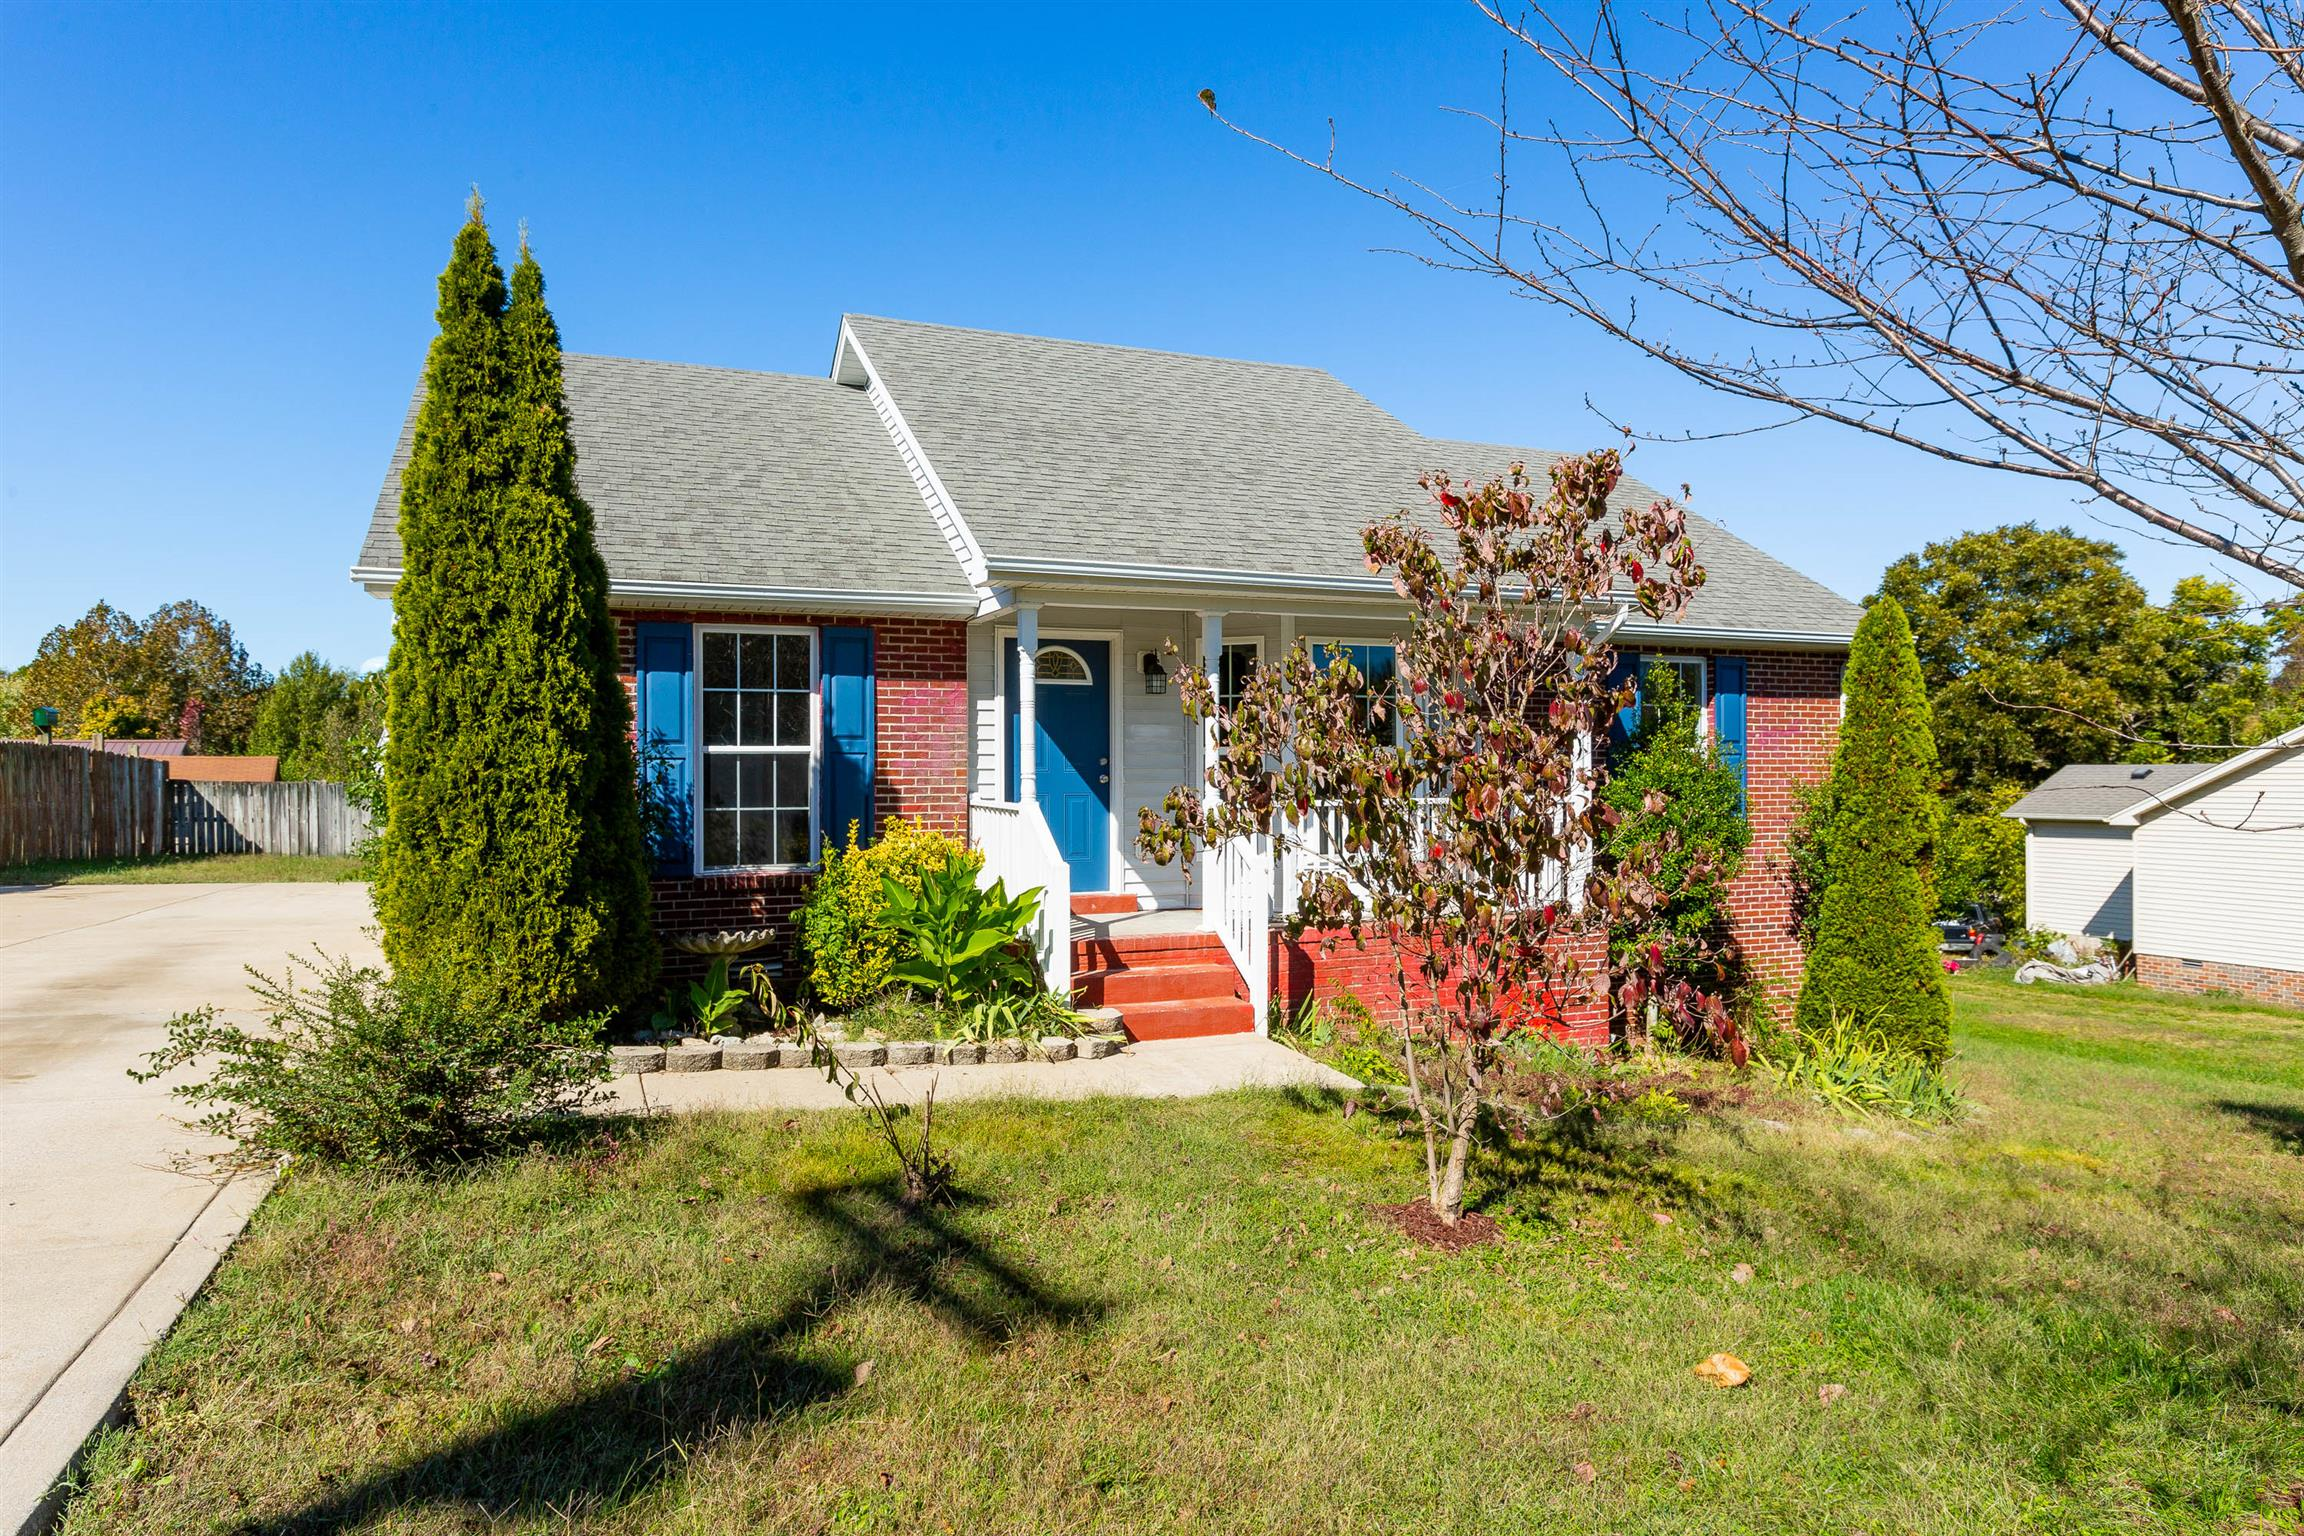 304 Westminster Ln, Springfield, TN 37172 - Springfield, TN real estate listing